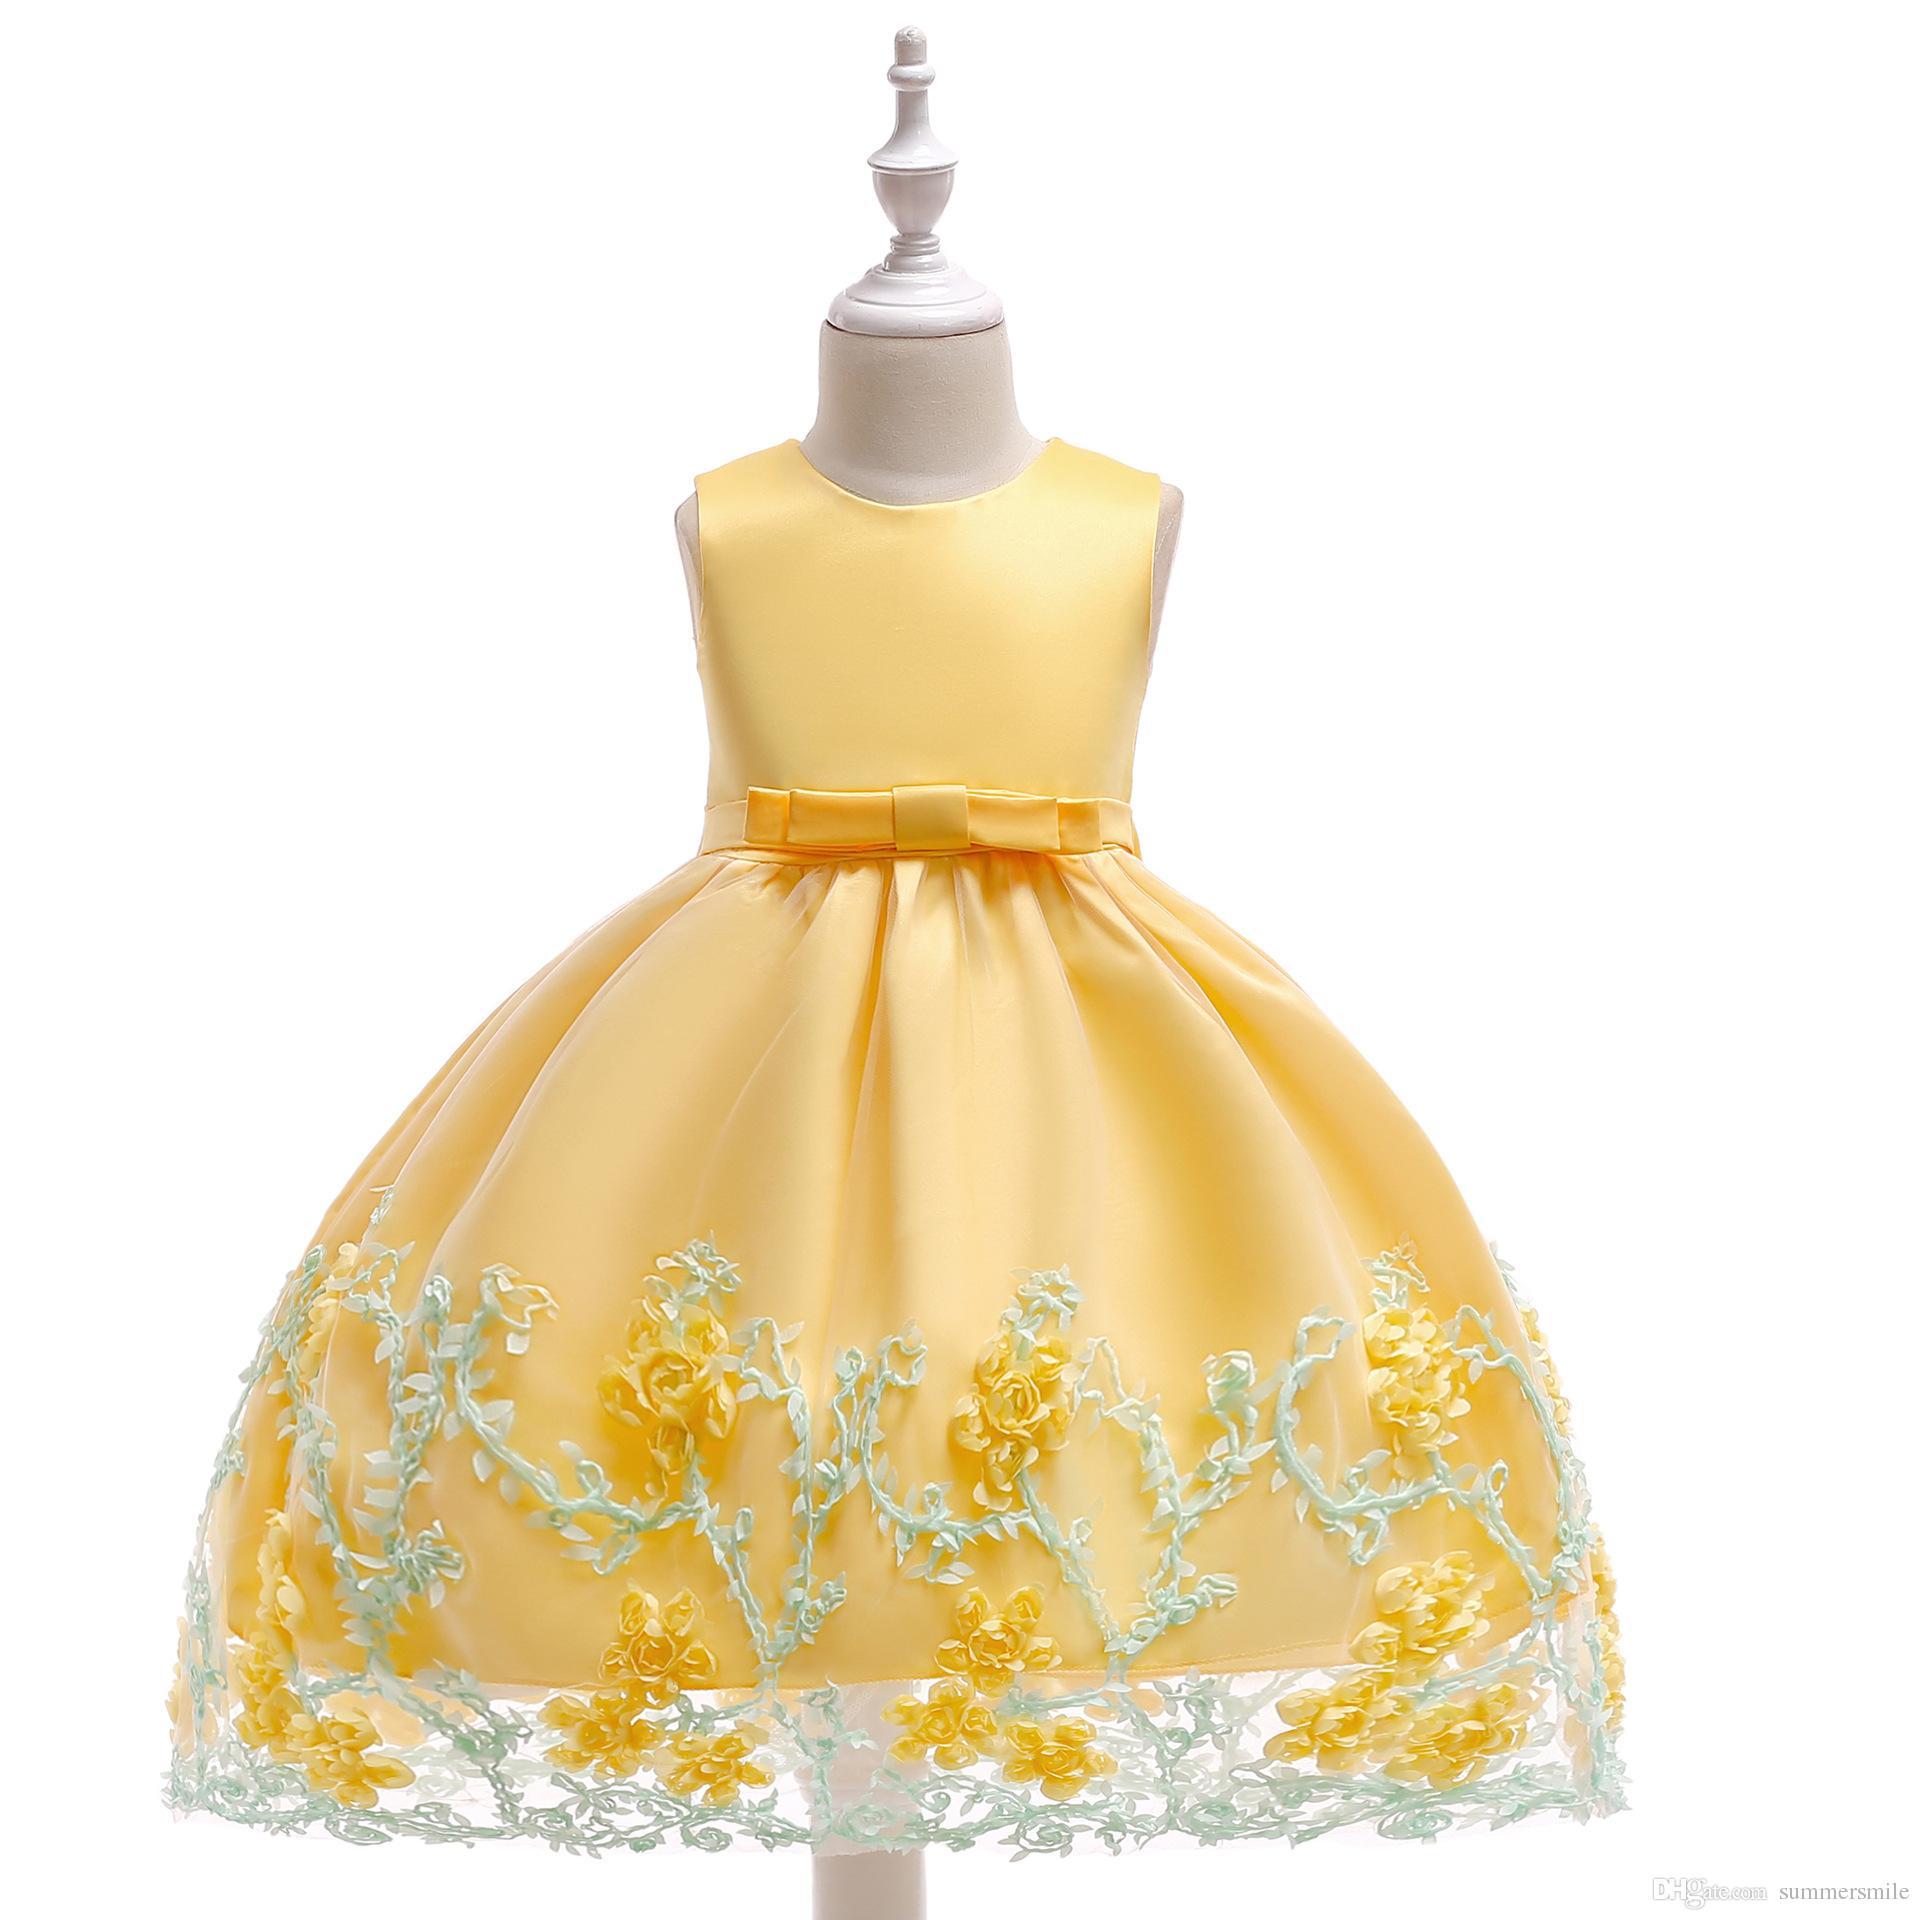 cc486f2d04 Children s Dresses Girls Flowers Wedding Dresses in the Big ...